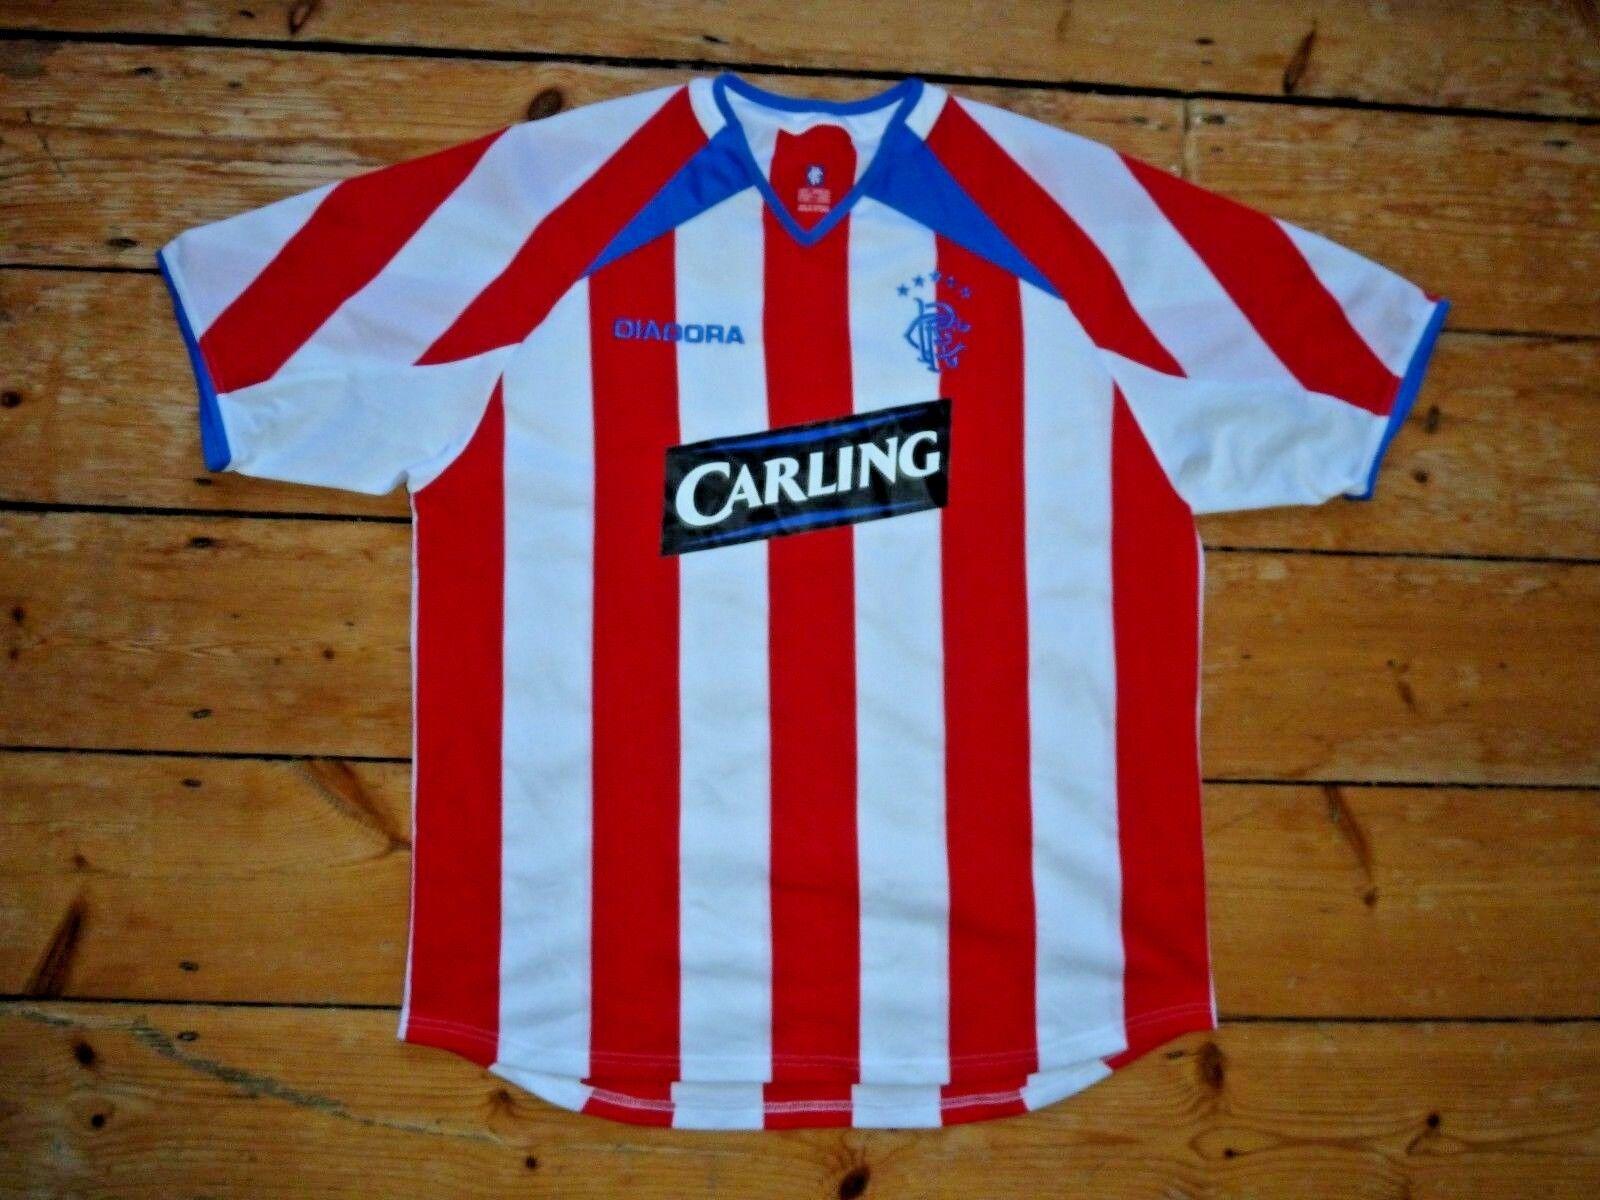 XL Glasgow Rangers Fußballtrikot Diadora 2003-04 Gers Fußballjersey Fußballjersey Gers 83ffd3